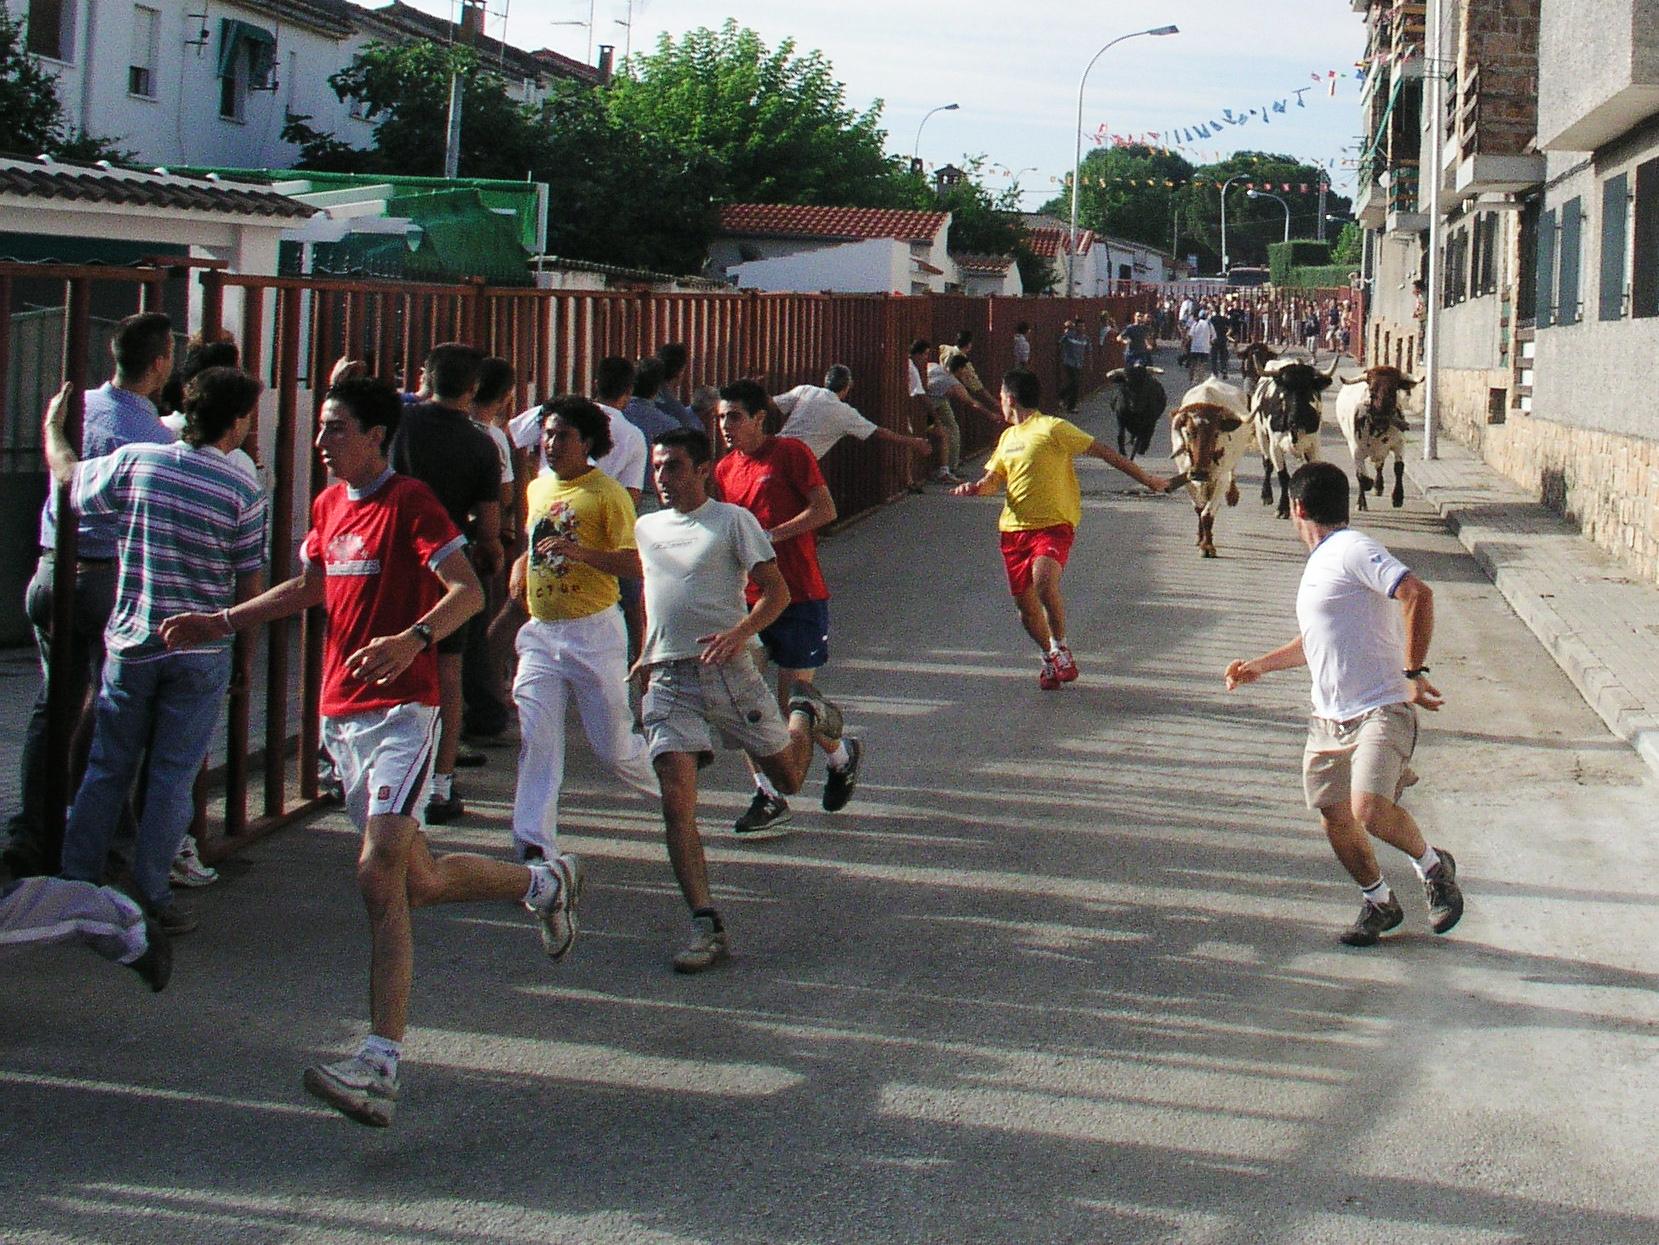 http://upload.wikimedia.org/wikipedia/commons/3/33/Aldea_del_Fresno_Encierro01.jpg